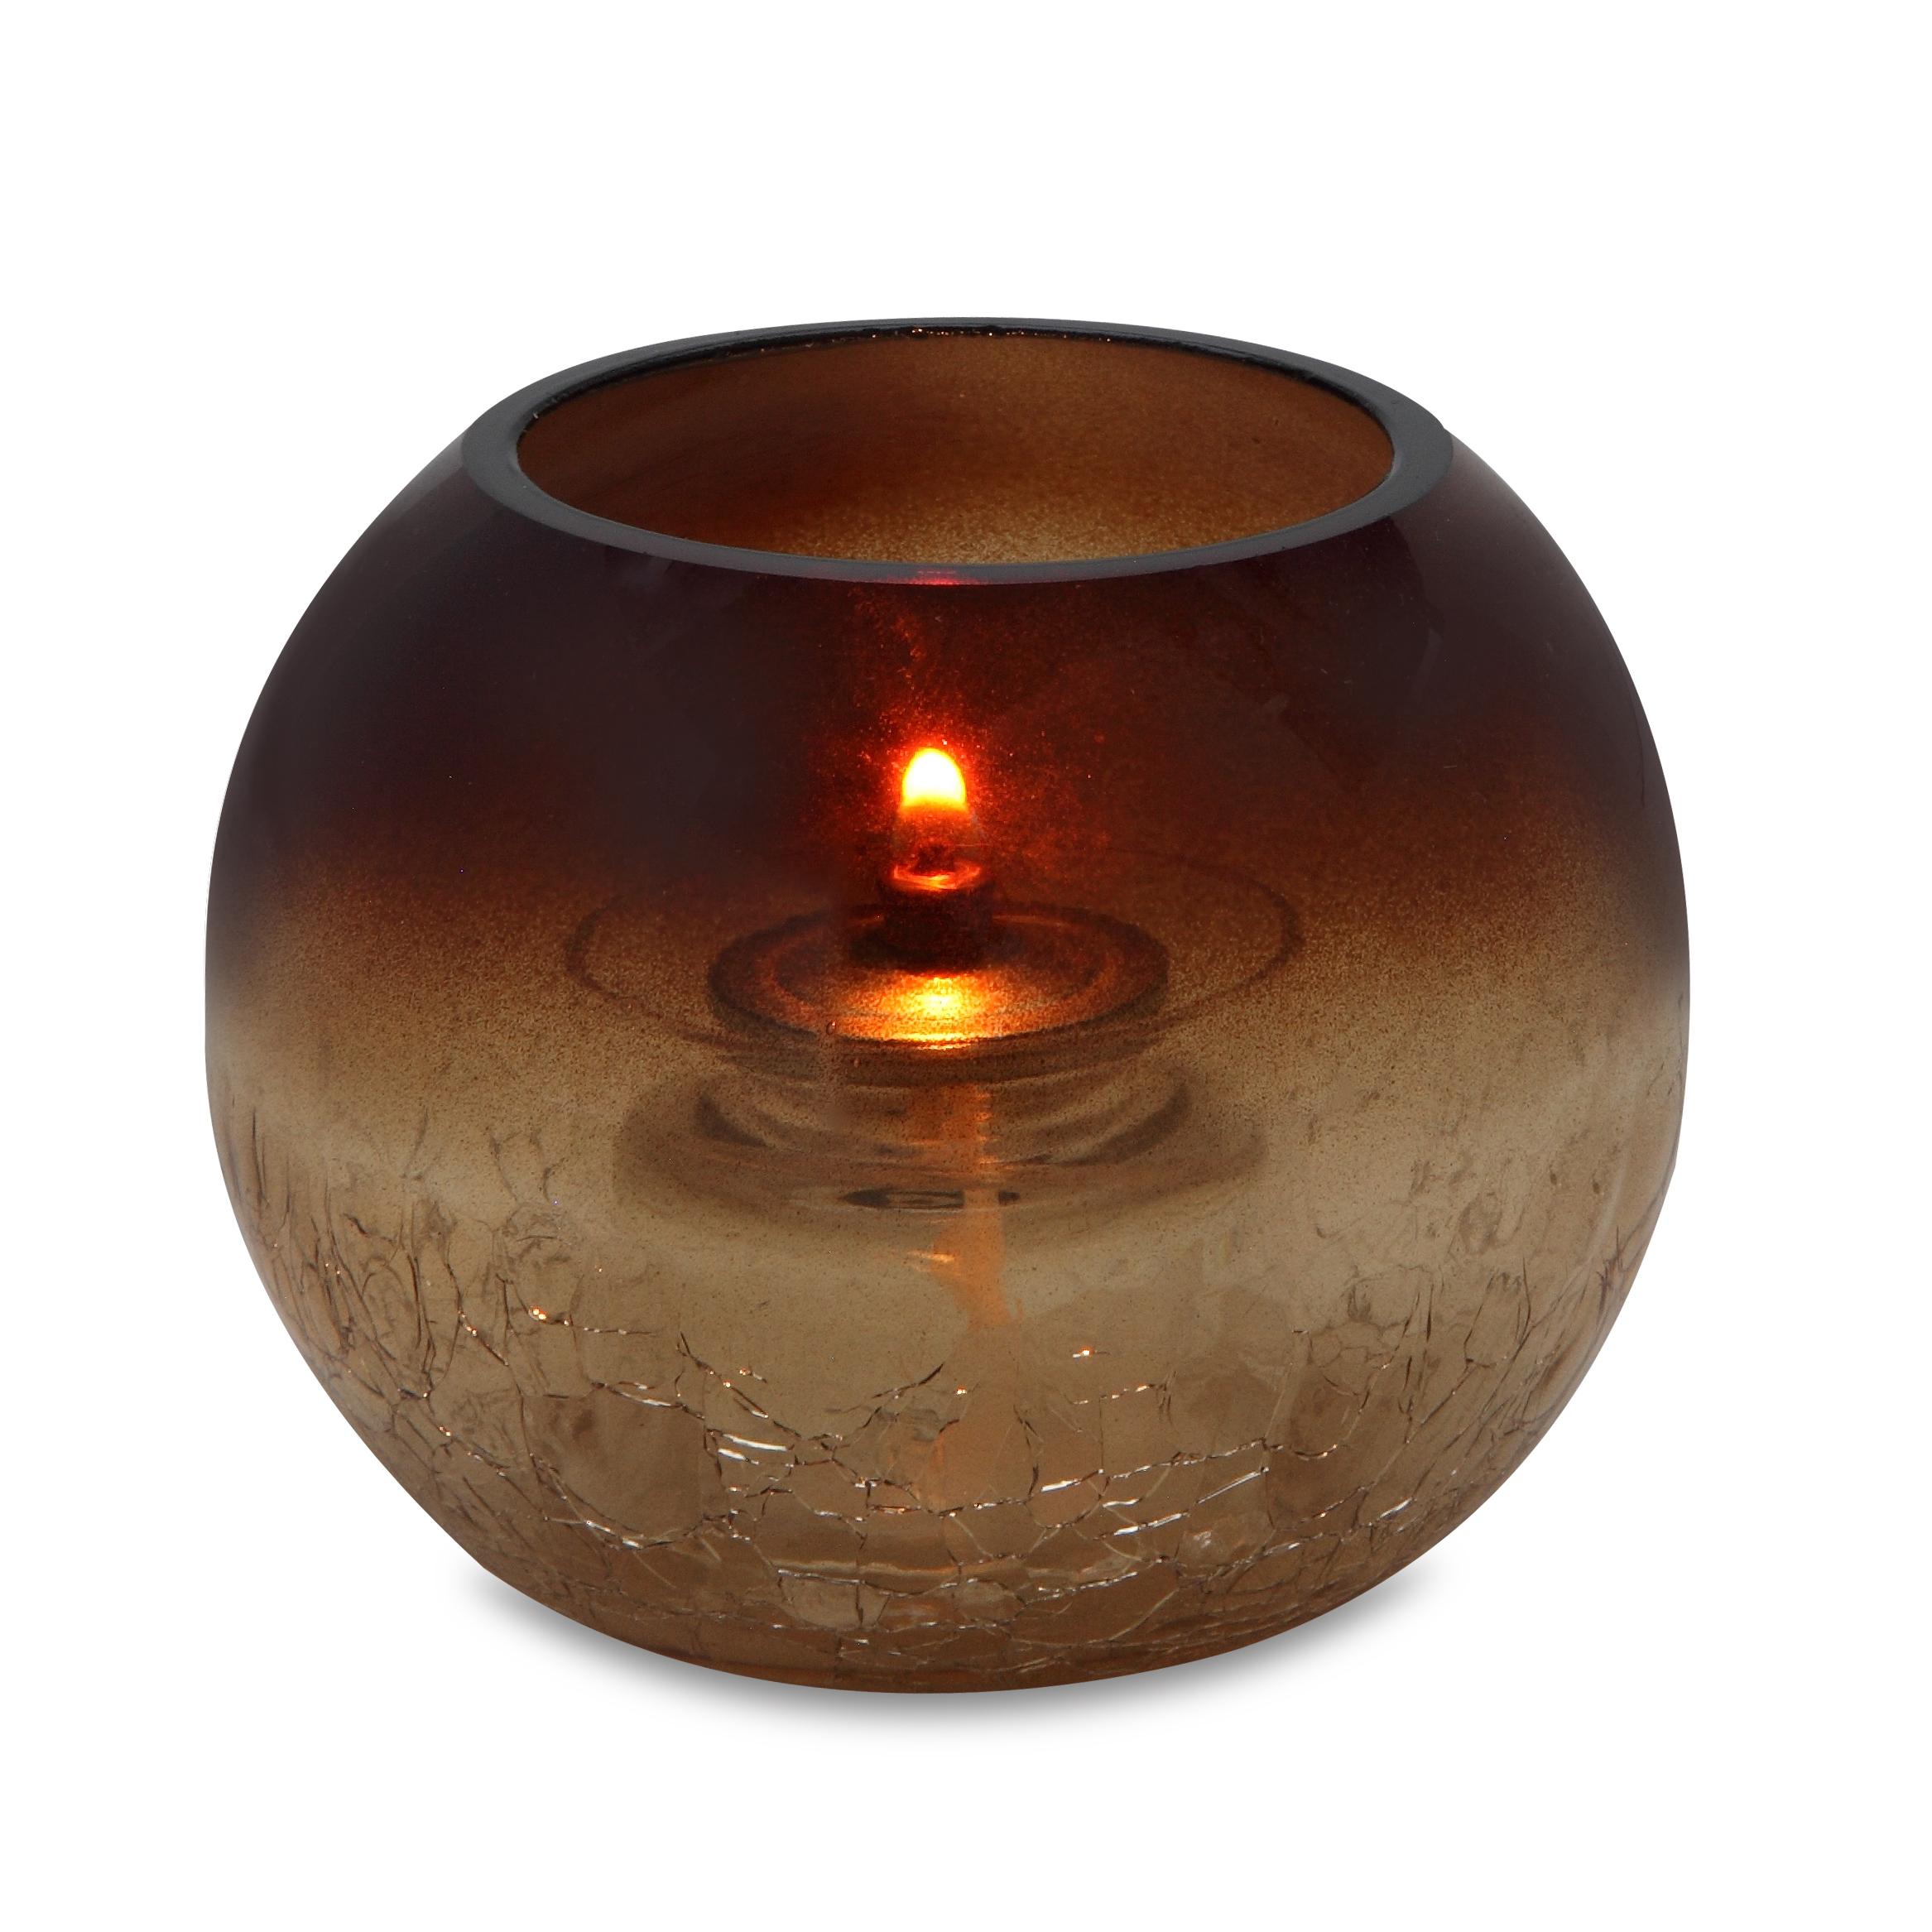 Sterno 80288 lamp